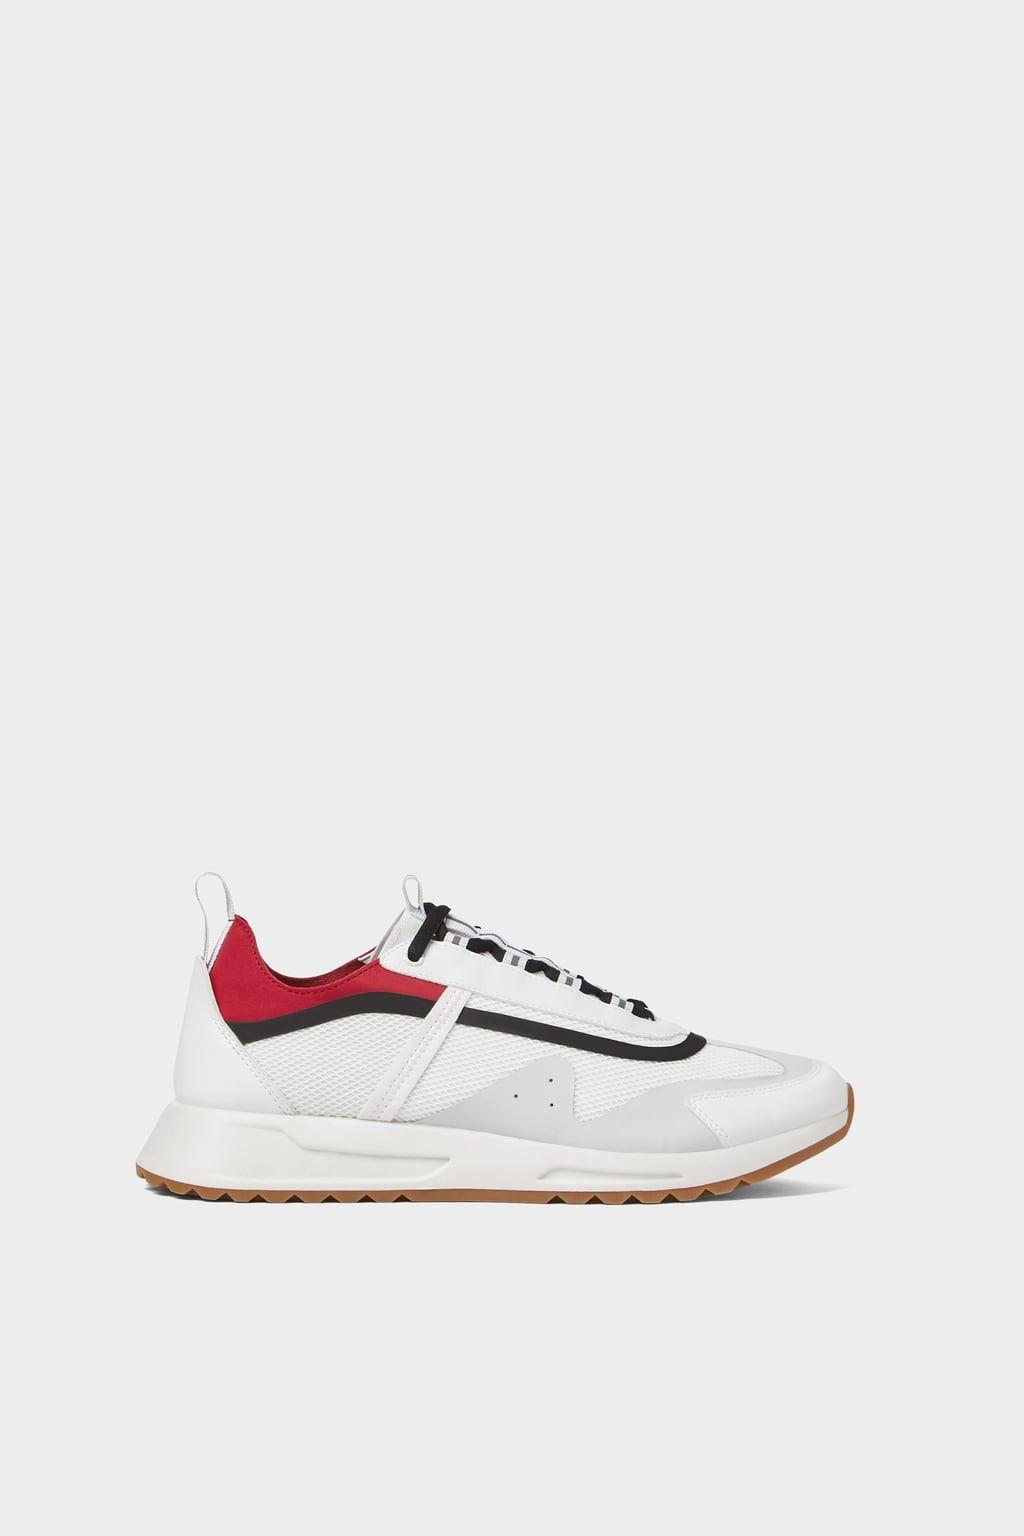 vita sneakers herr 2016